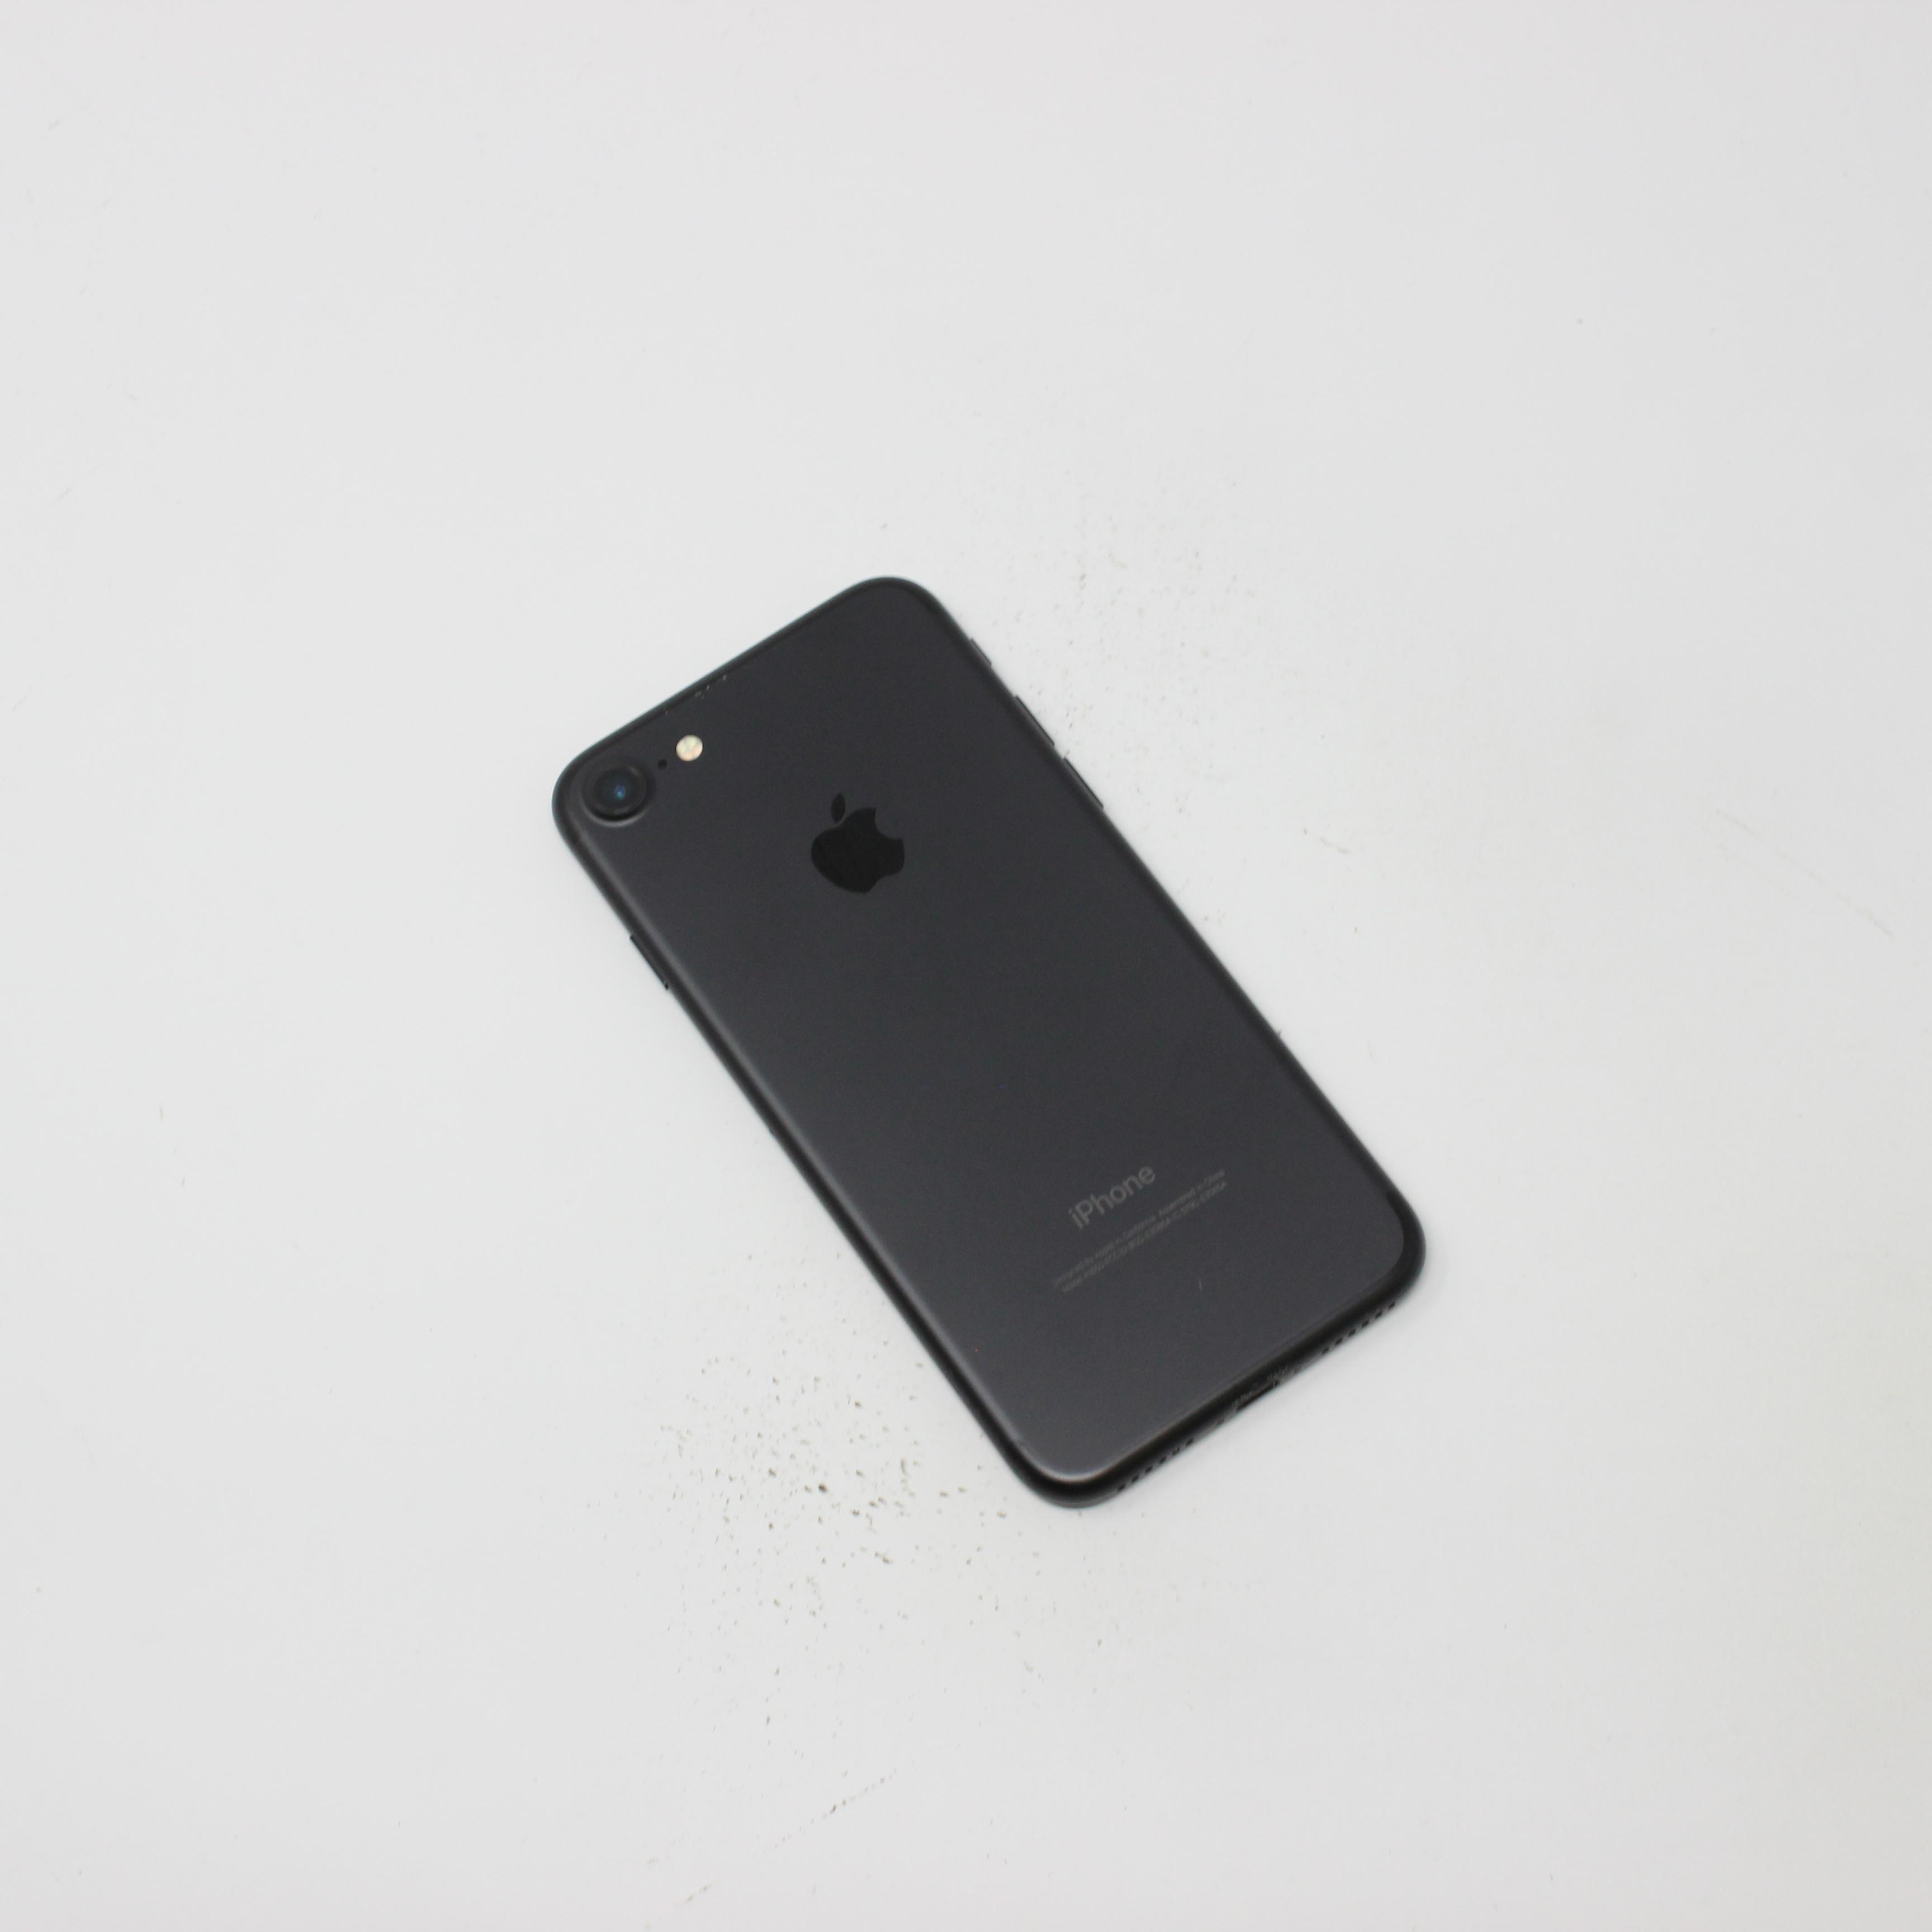 iPhone 7 32GB Black - Verizon photo 3   UpTradeit.com